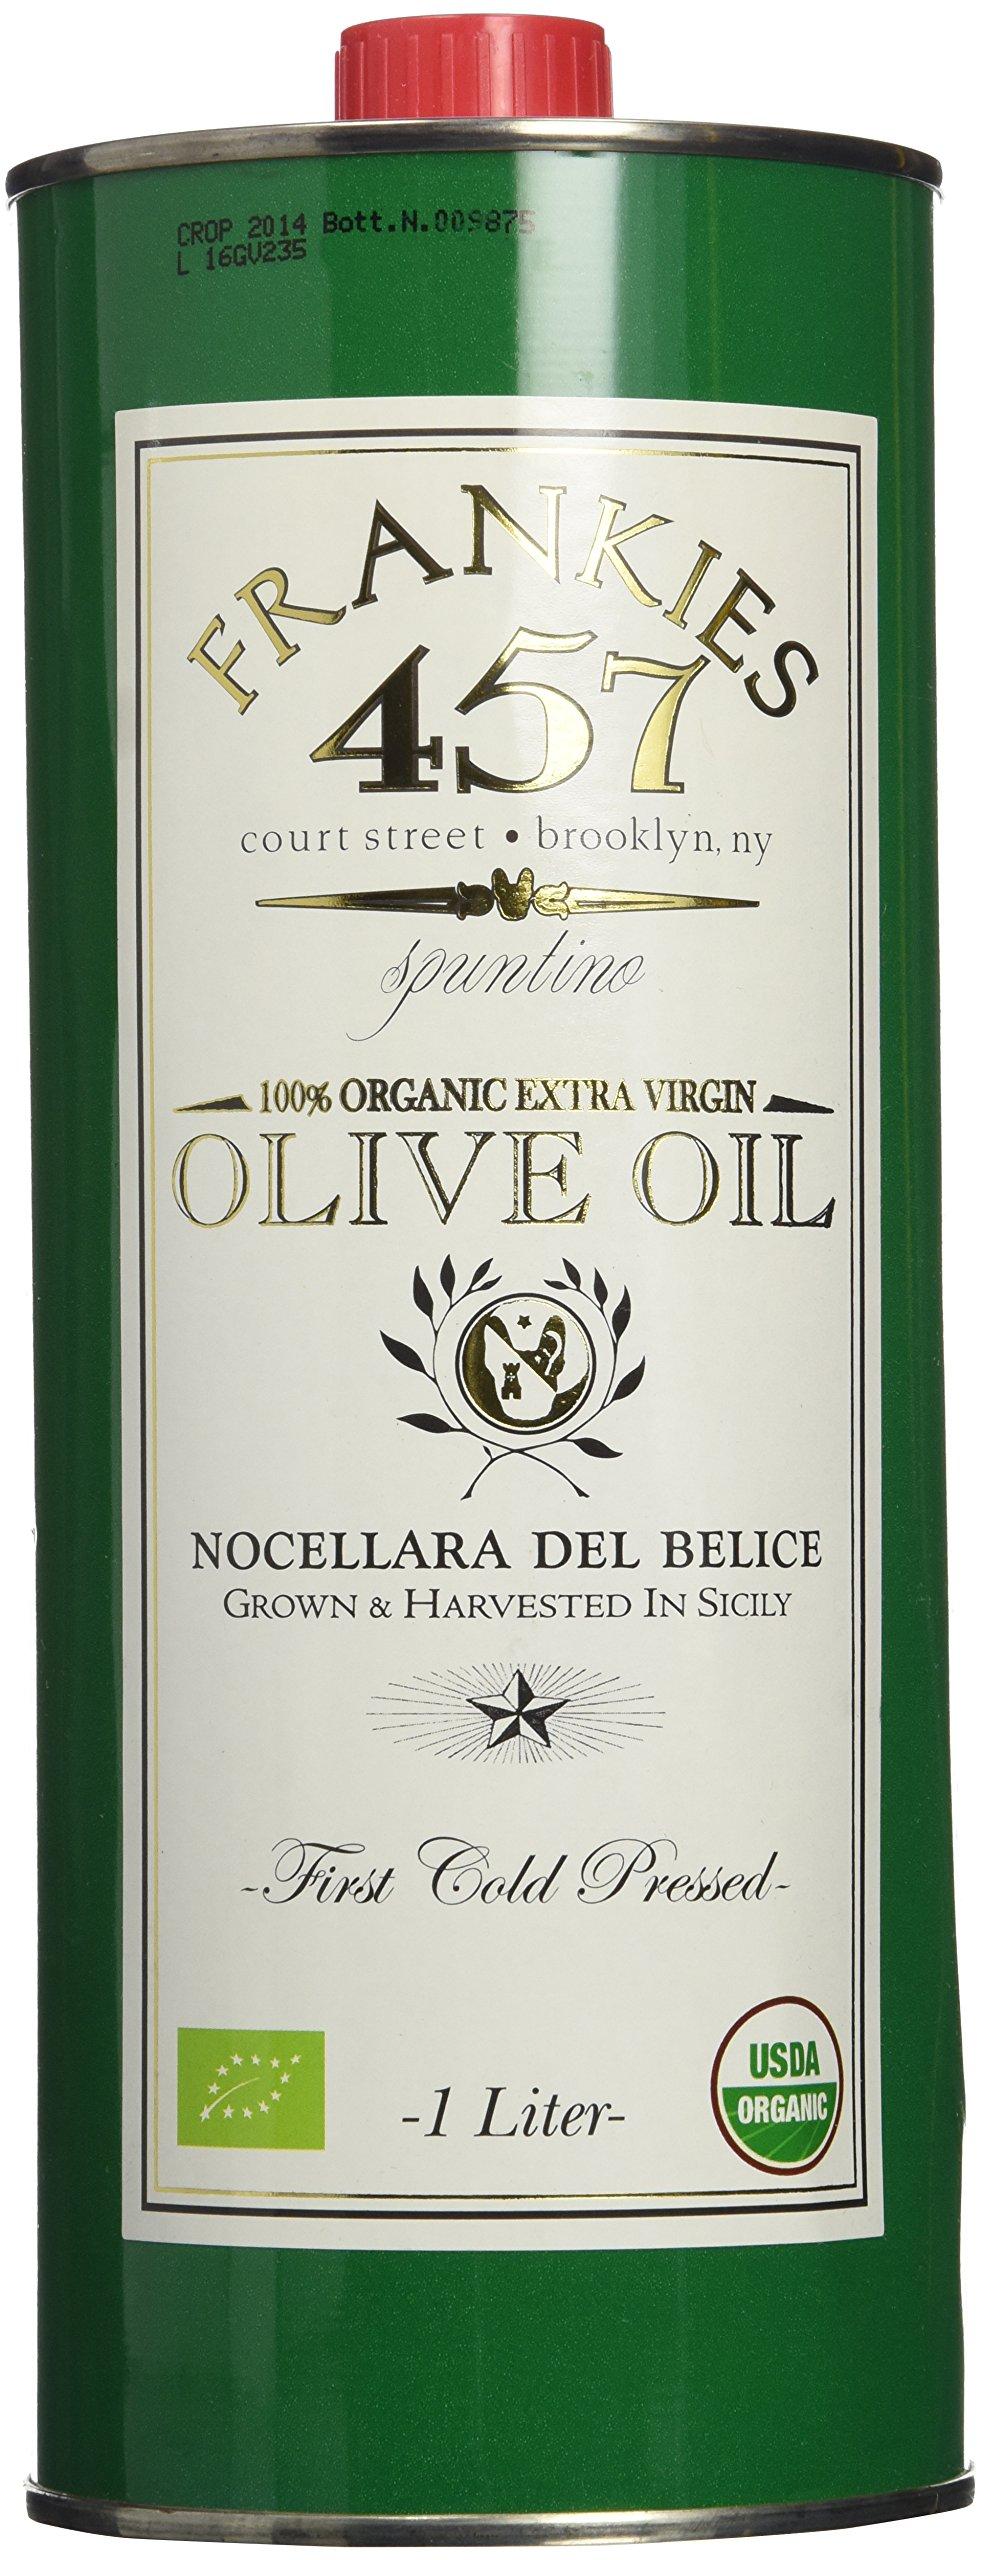 Frankies 457 Spuntino Extra Virgin Olive Oil - 1 liter by Frankies